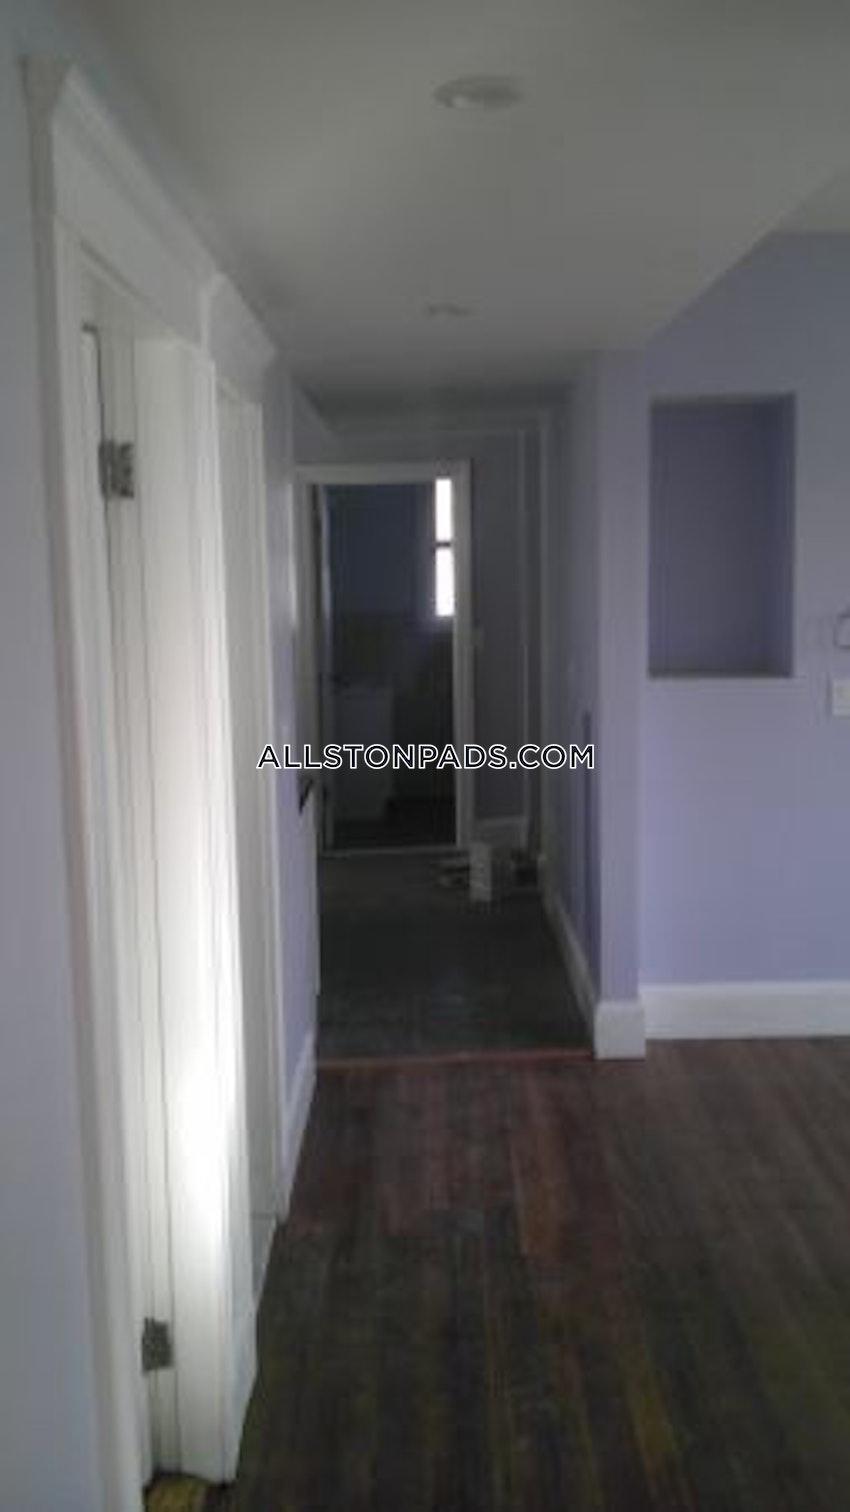 BOSTON - ALLSTON - 3 Beds, 2 Baths - Image 5